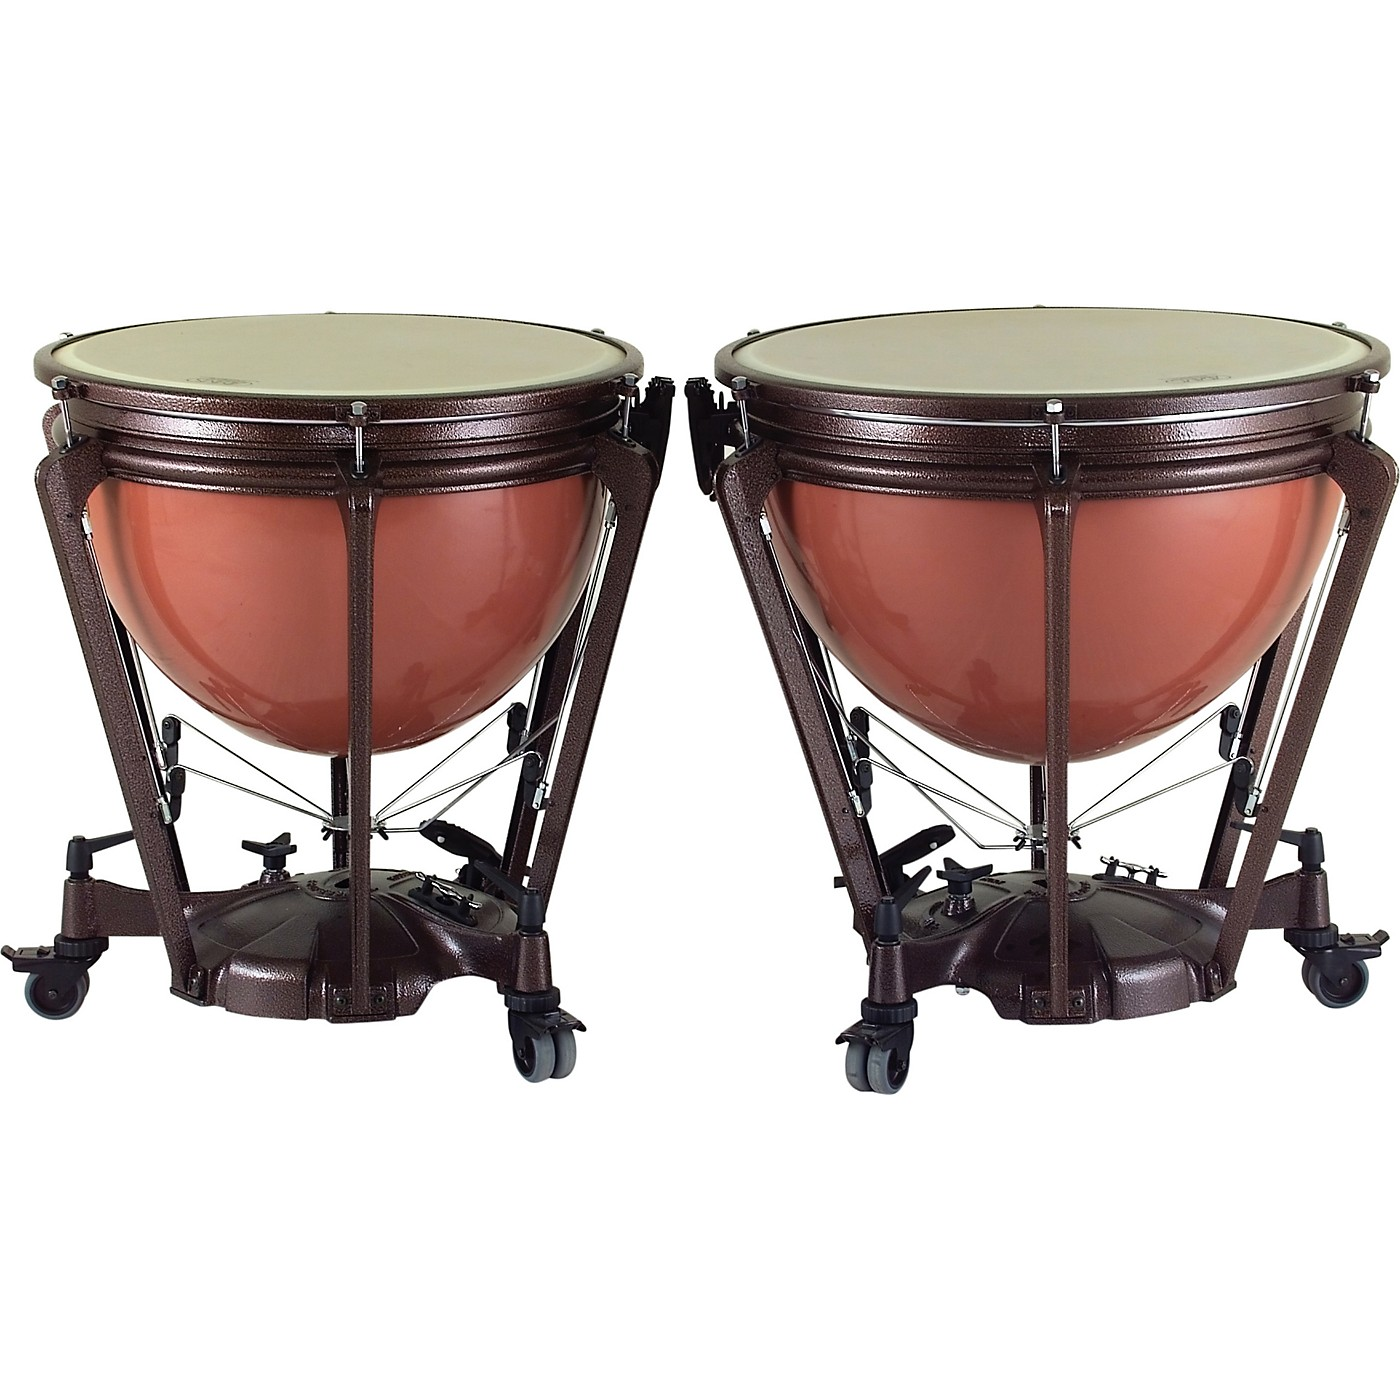 Adams Professional Series Fiberglass Timpani Concert Drums thumbnail